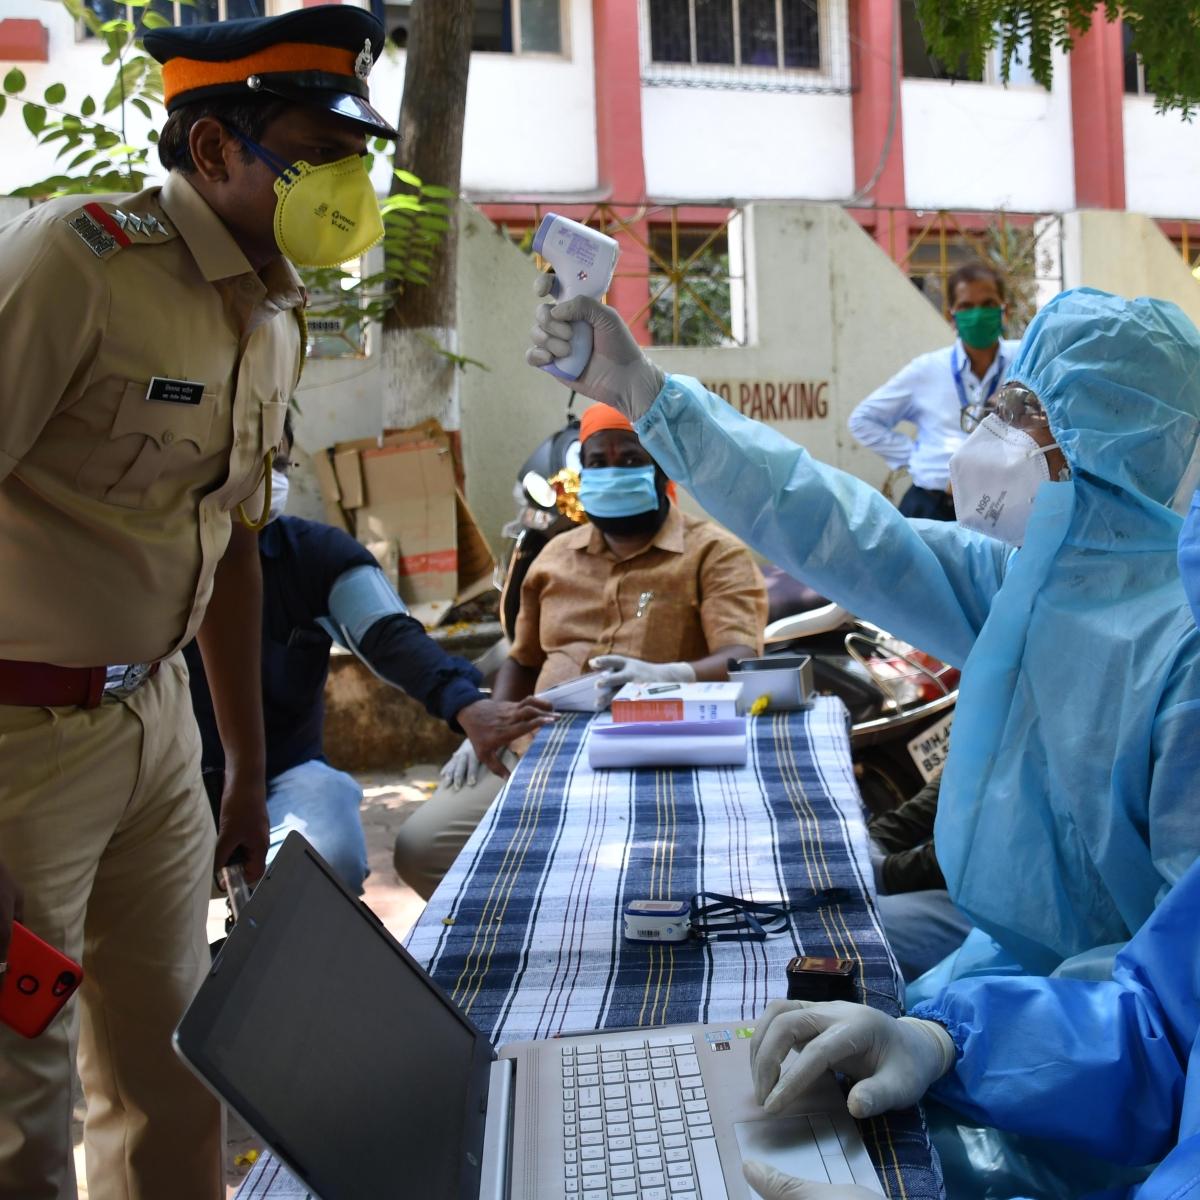 Coronavirus in Navi Mumbai: NMMC urges those with COVID-19 symptoms to take free antigen test